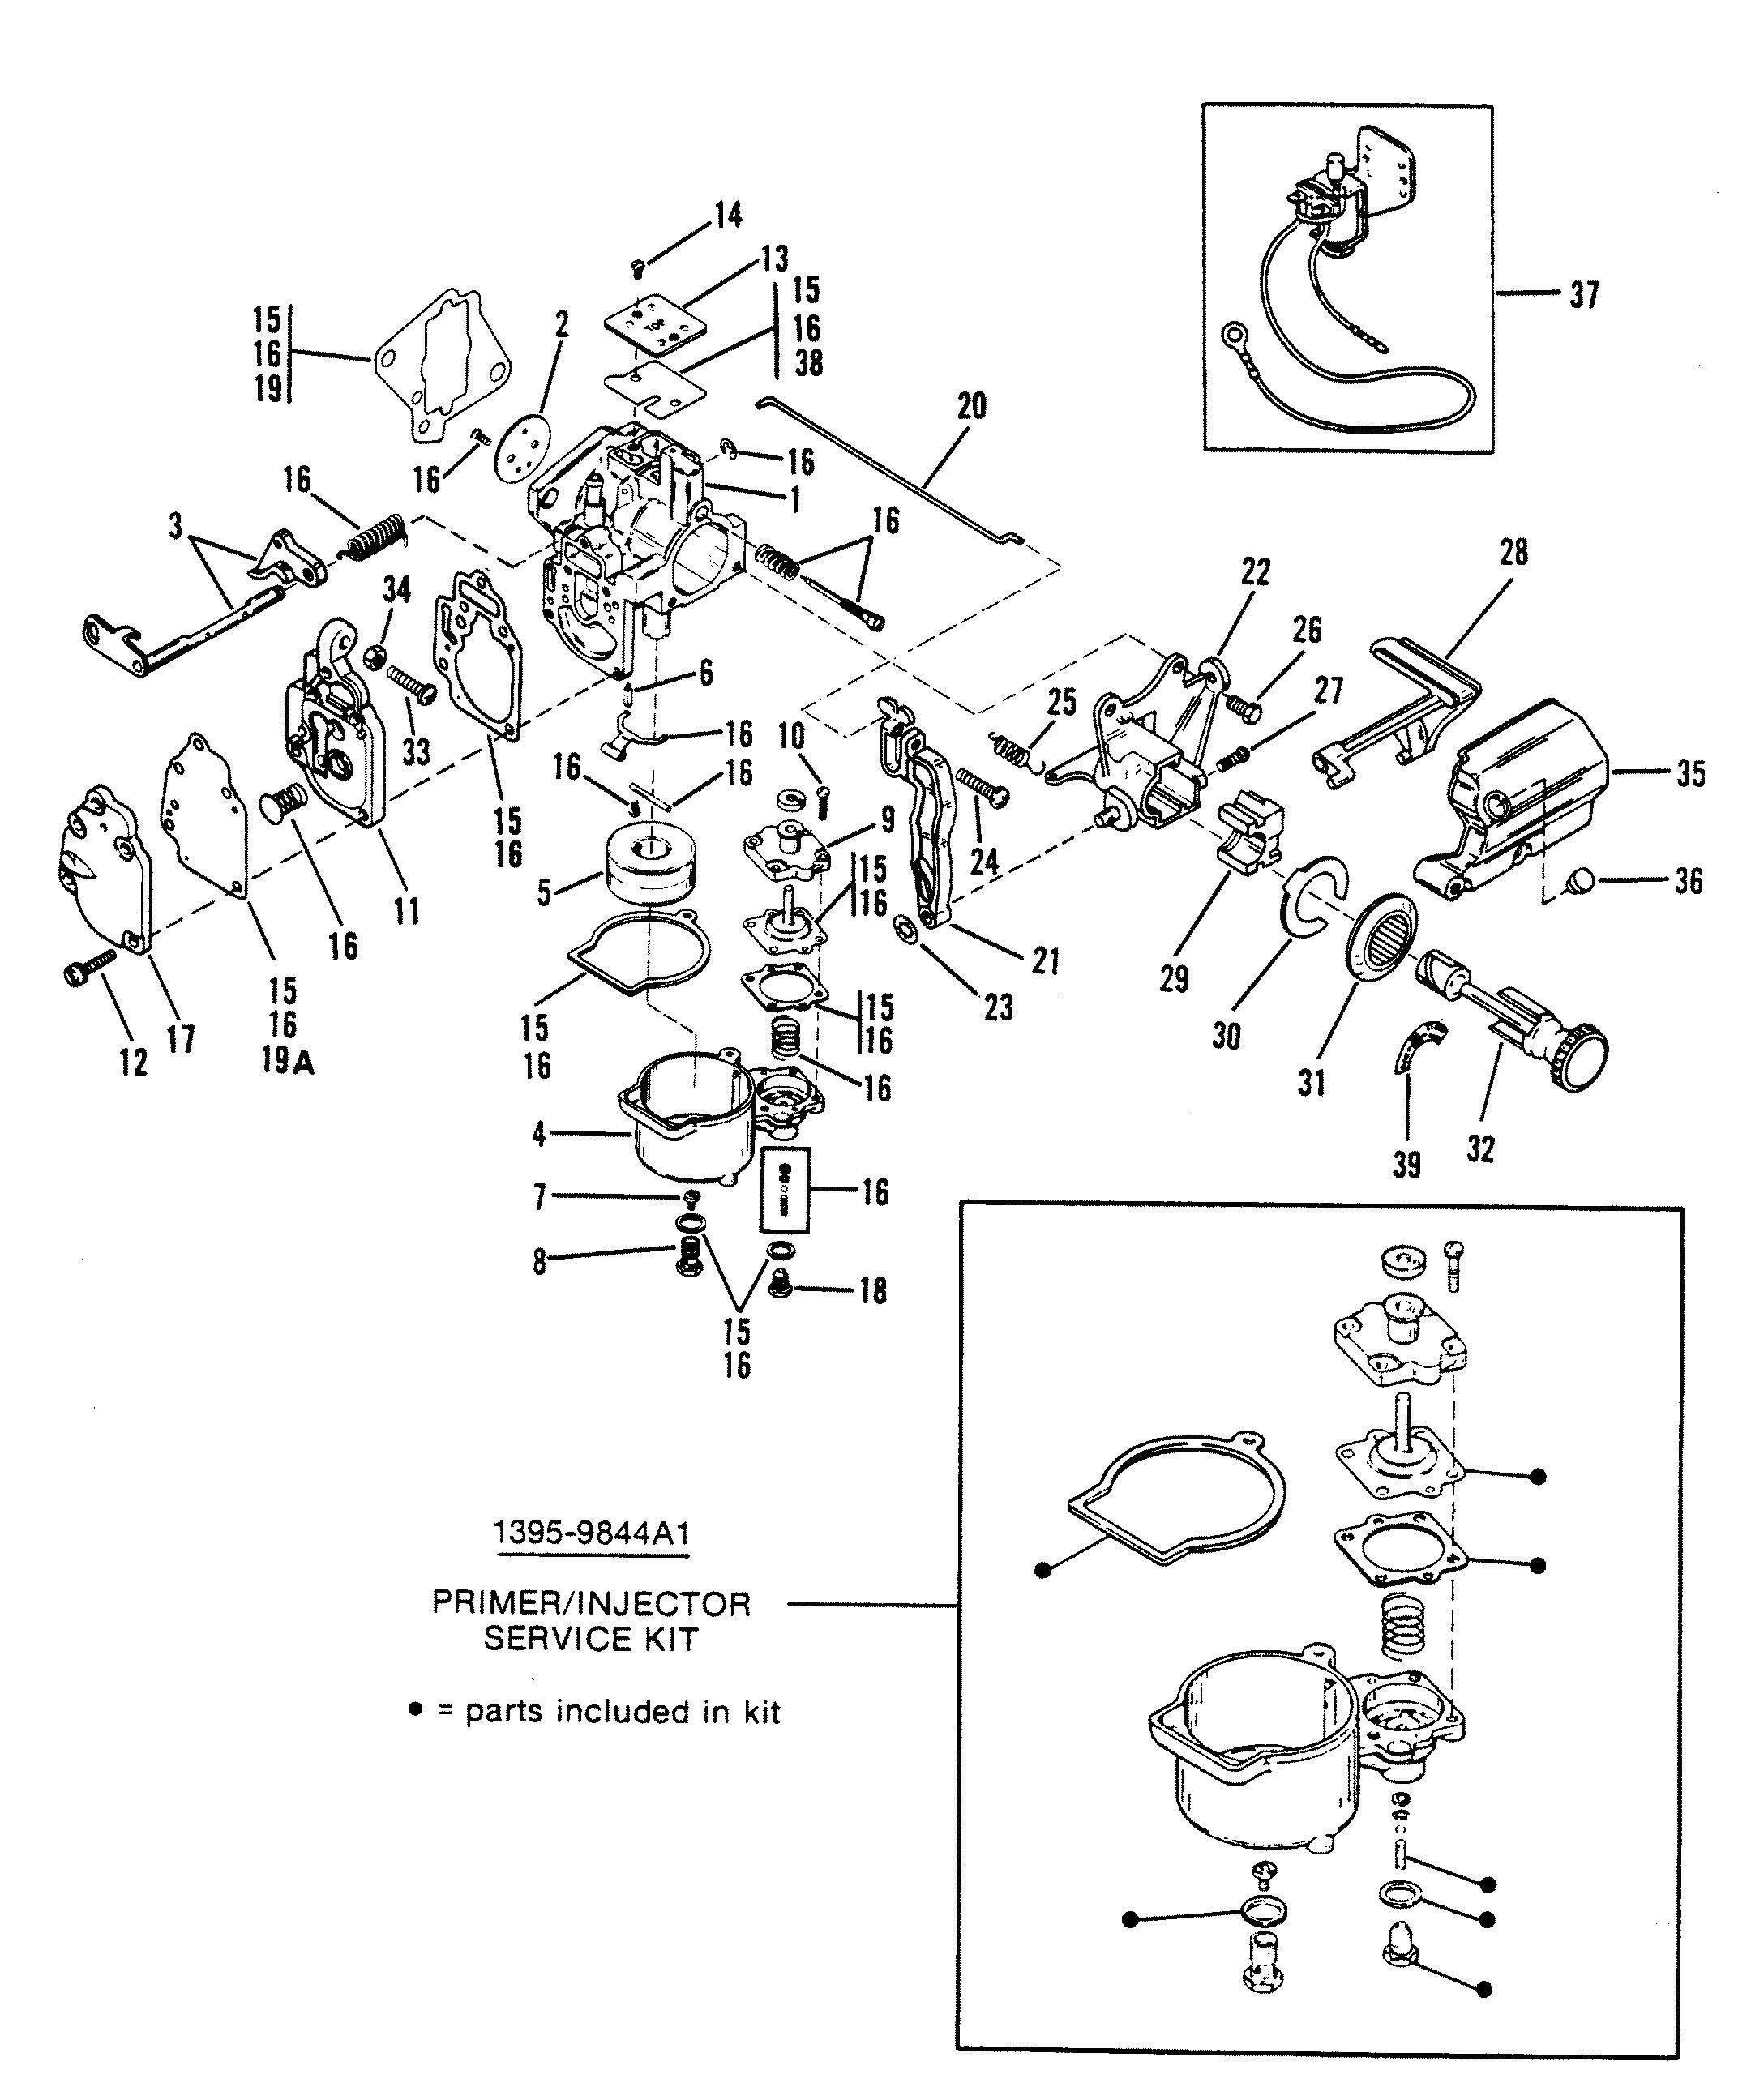 carburetor assembly wmc 1717b17c 1818a18b  20  20a  20b